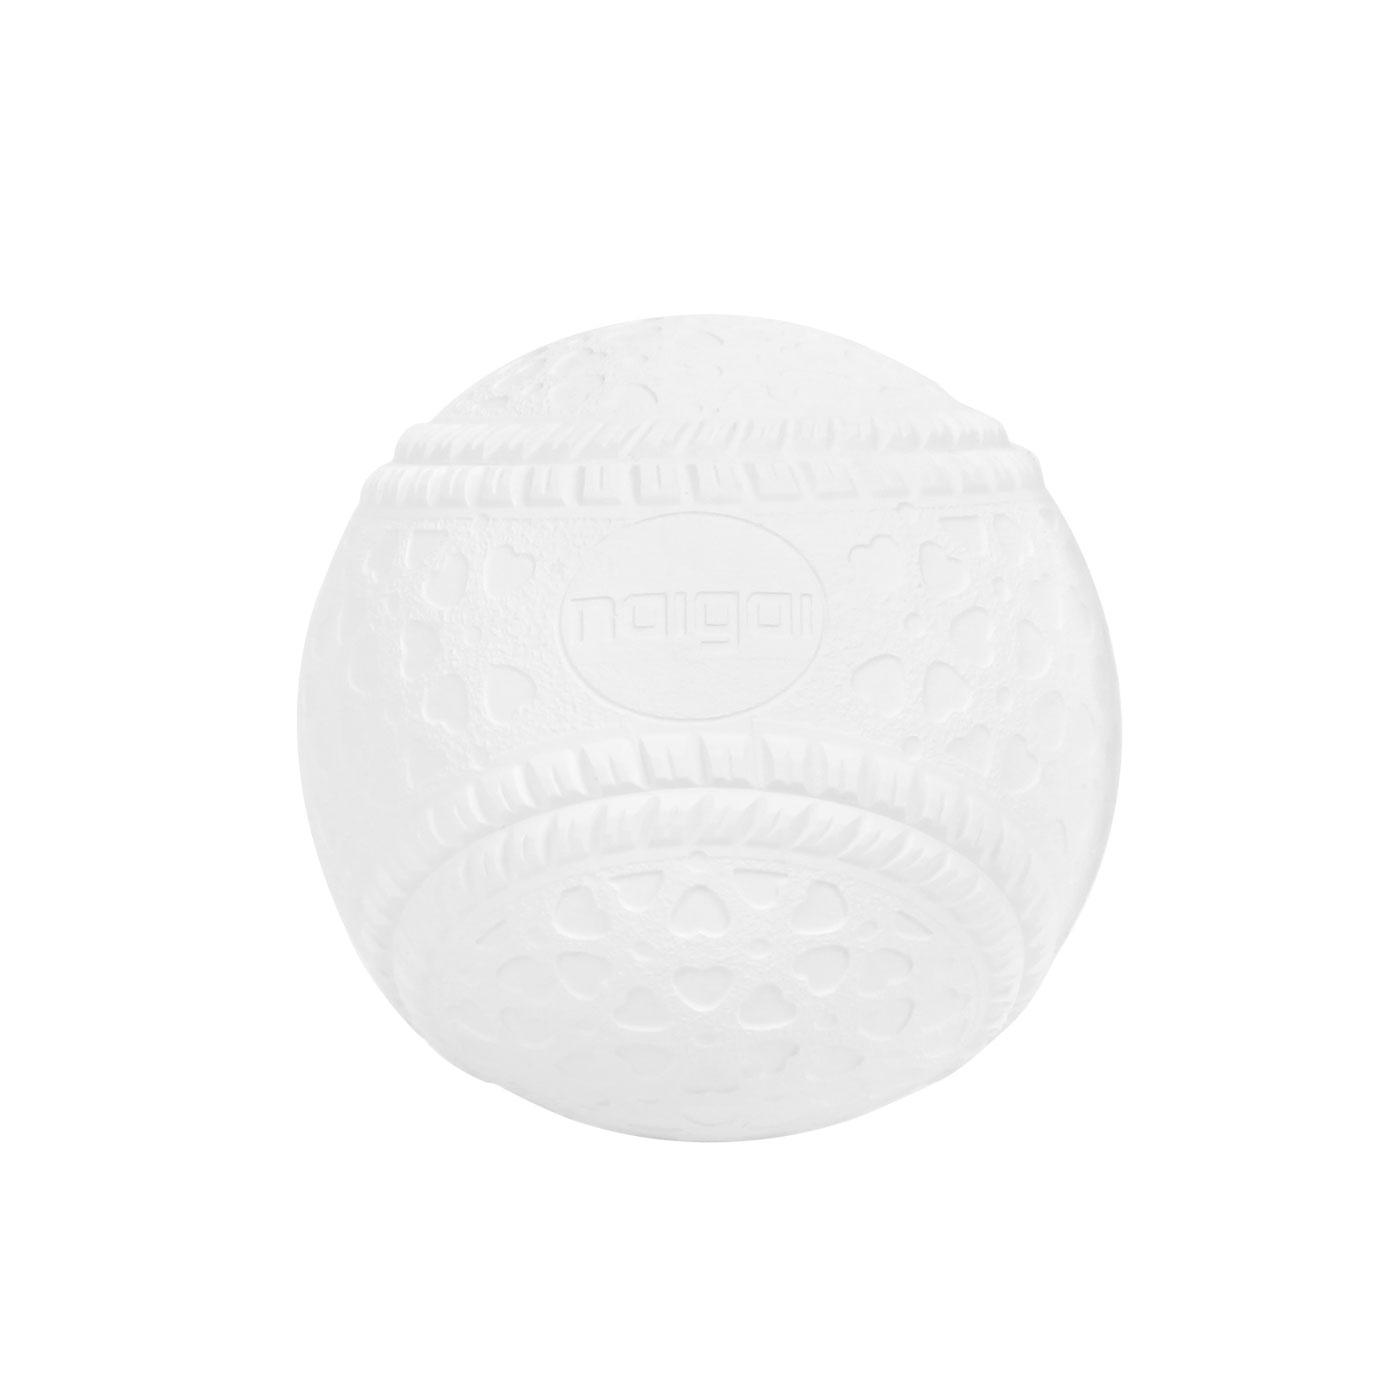 JEX田徑用品 日製-軟式棒球(單顆裝)A-BABL-211M-1